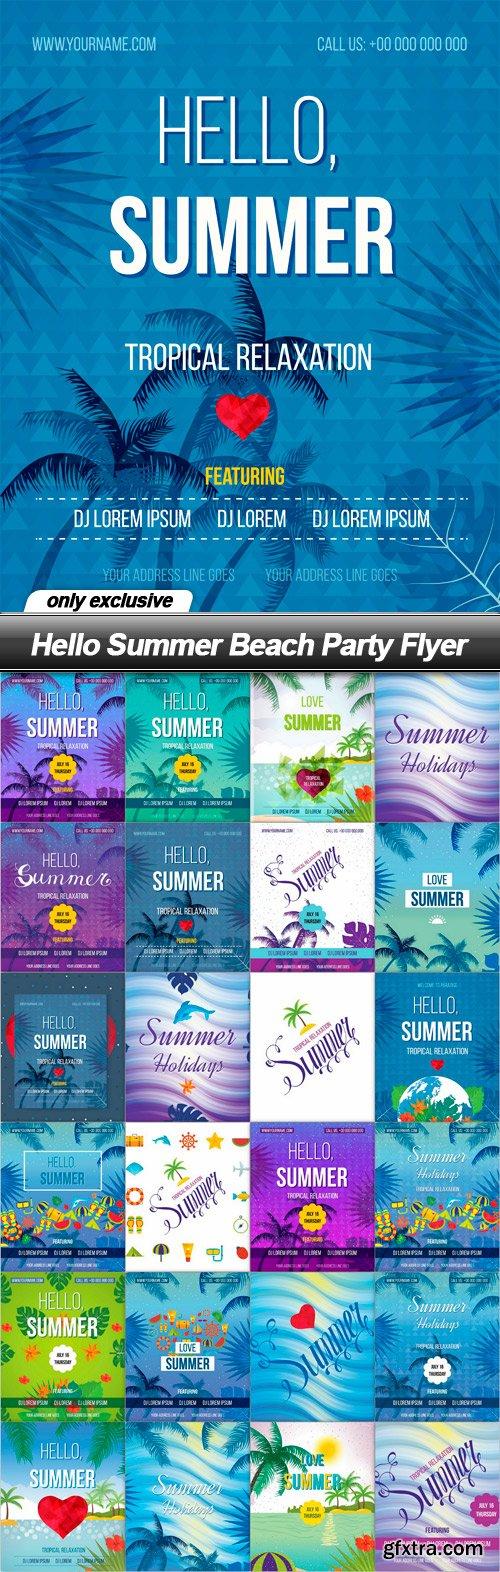 Hello Summer Beach Party Flyer - 25 EPS